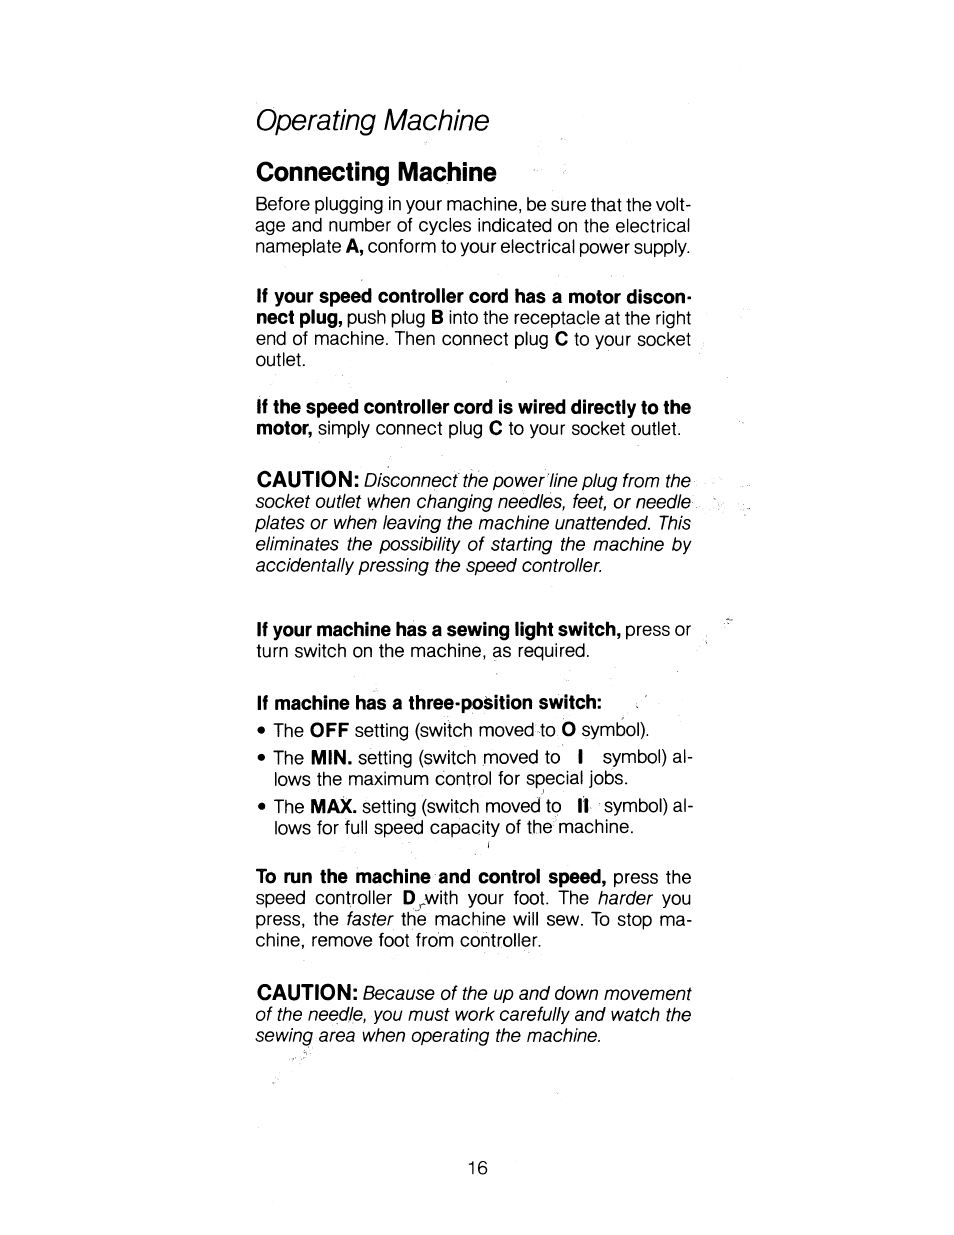 Connecting machine, Operating machine | SINGER 1263 User Manual